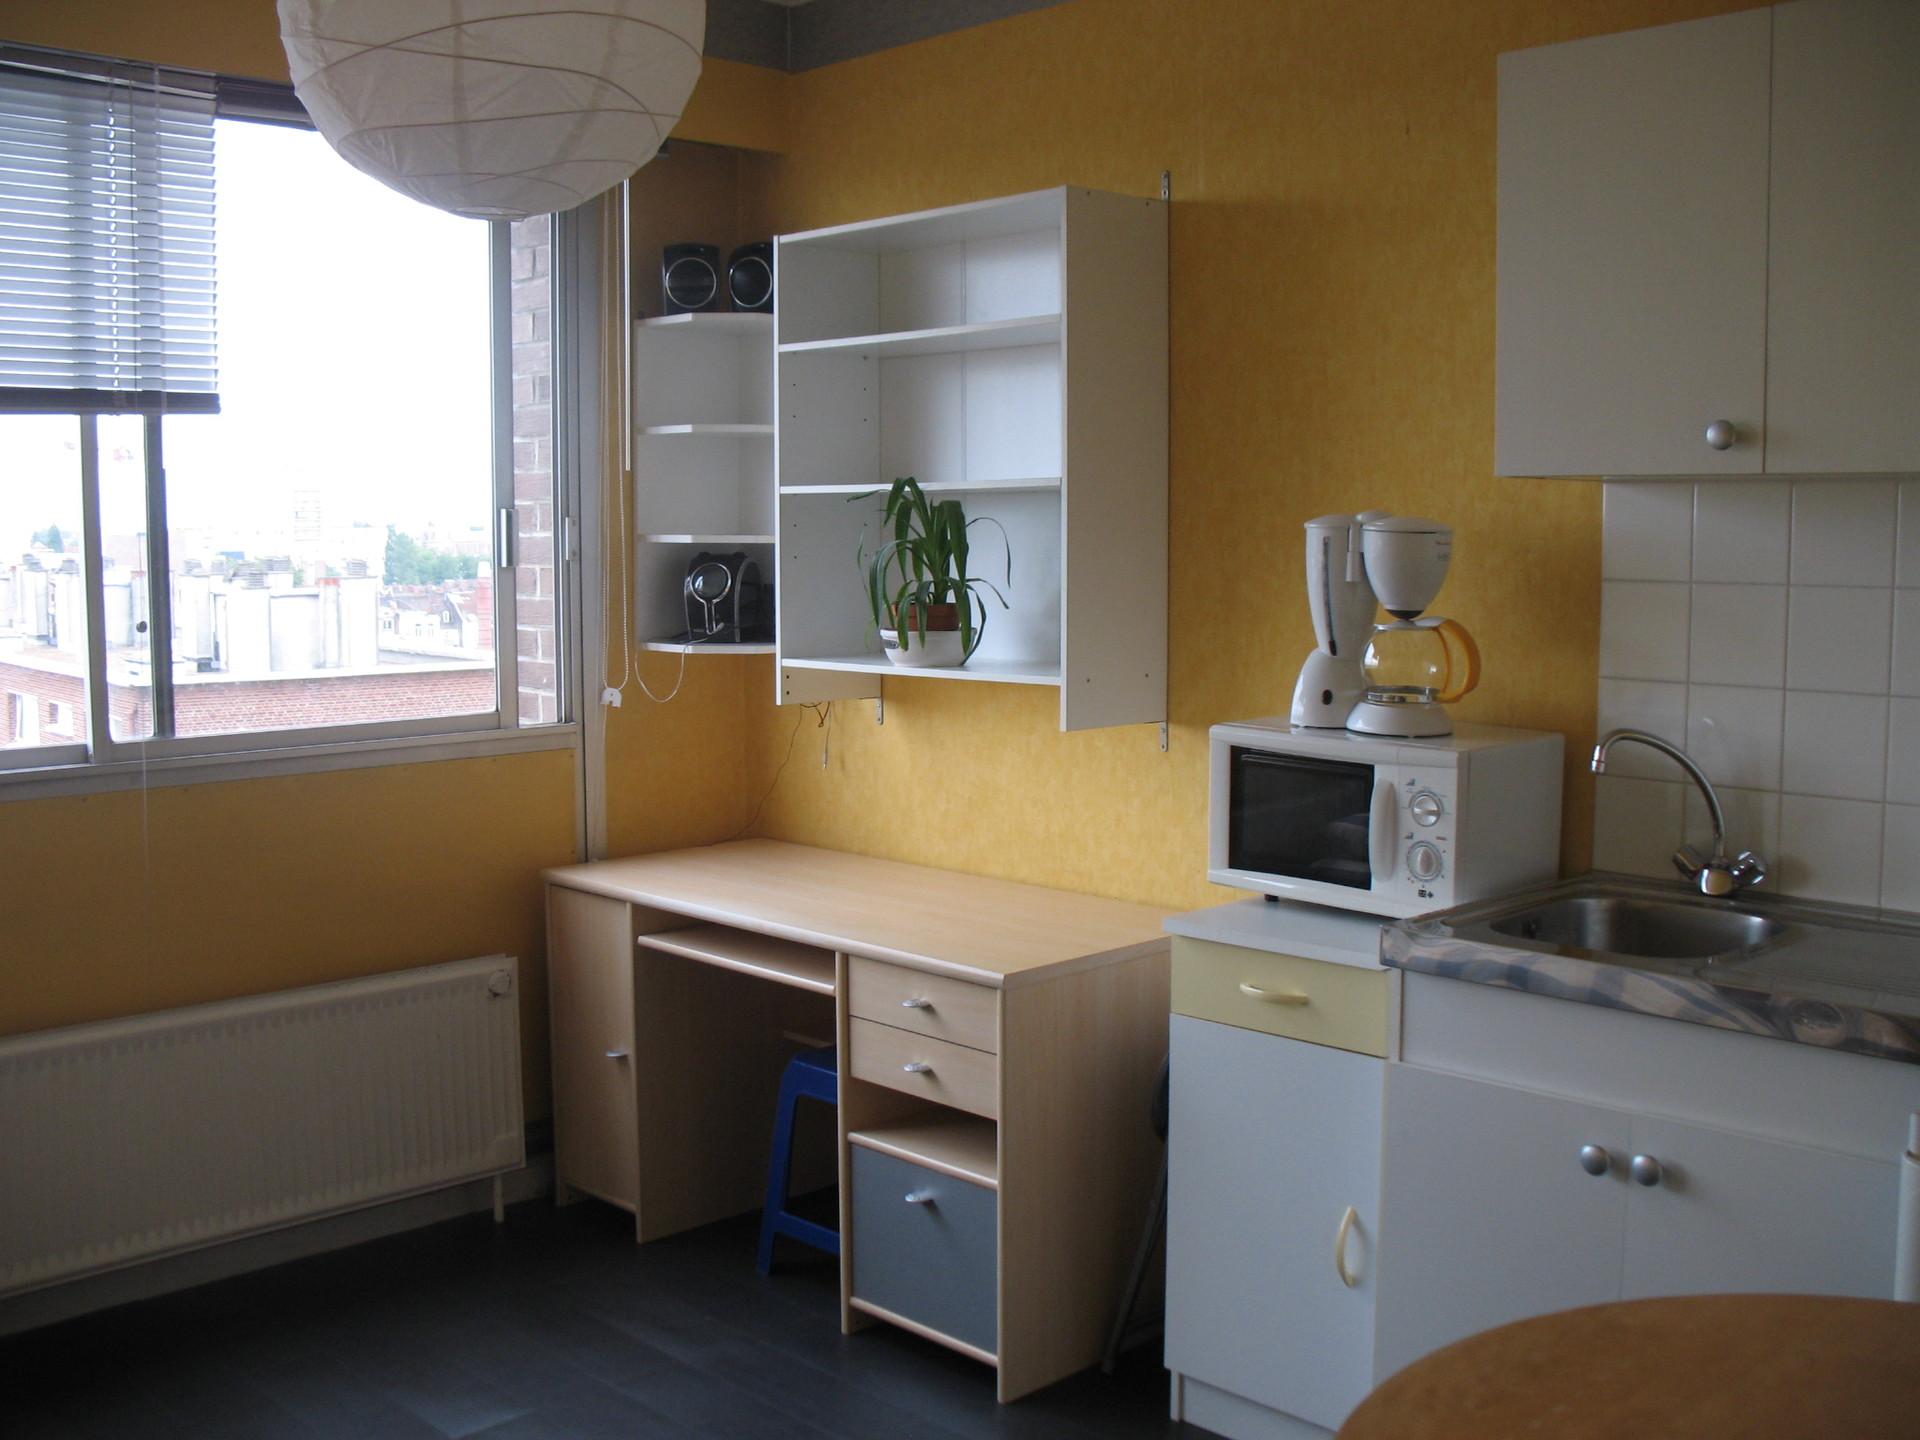 studio-a-lille-secteur-vauban-73b0abaf5a